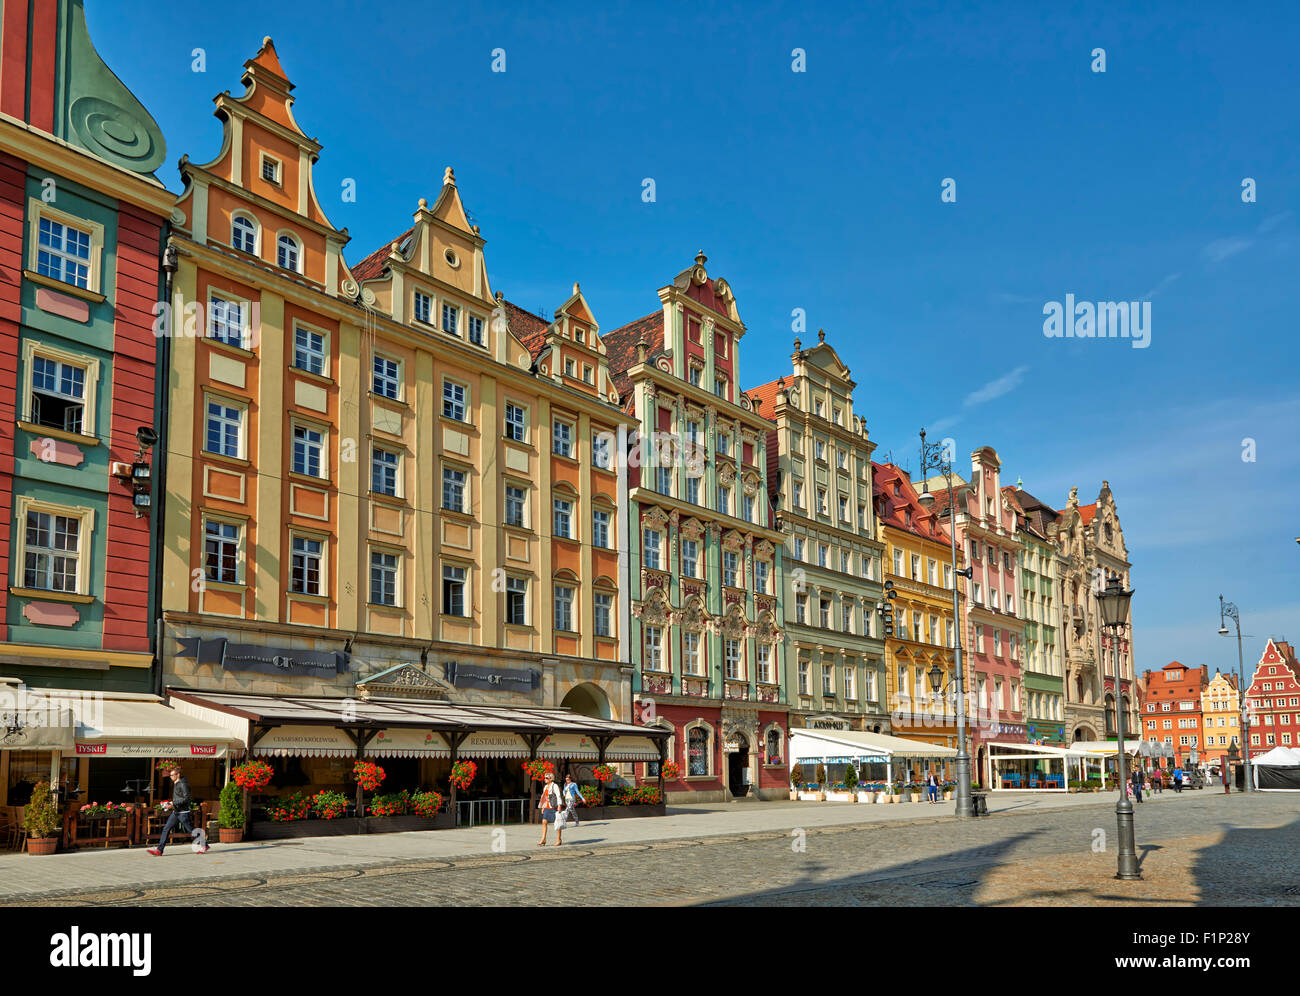 Market Square or Ryneck of Wroclaw, Lower Silesia, Poland, Europe Stock Photo